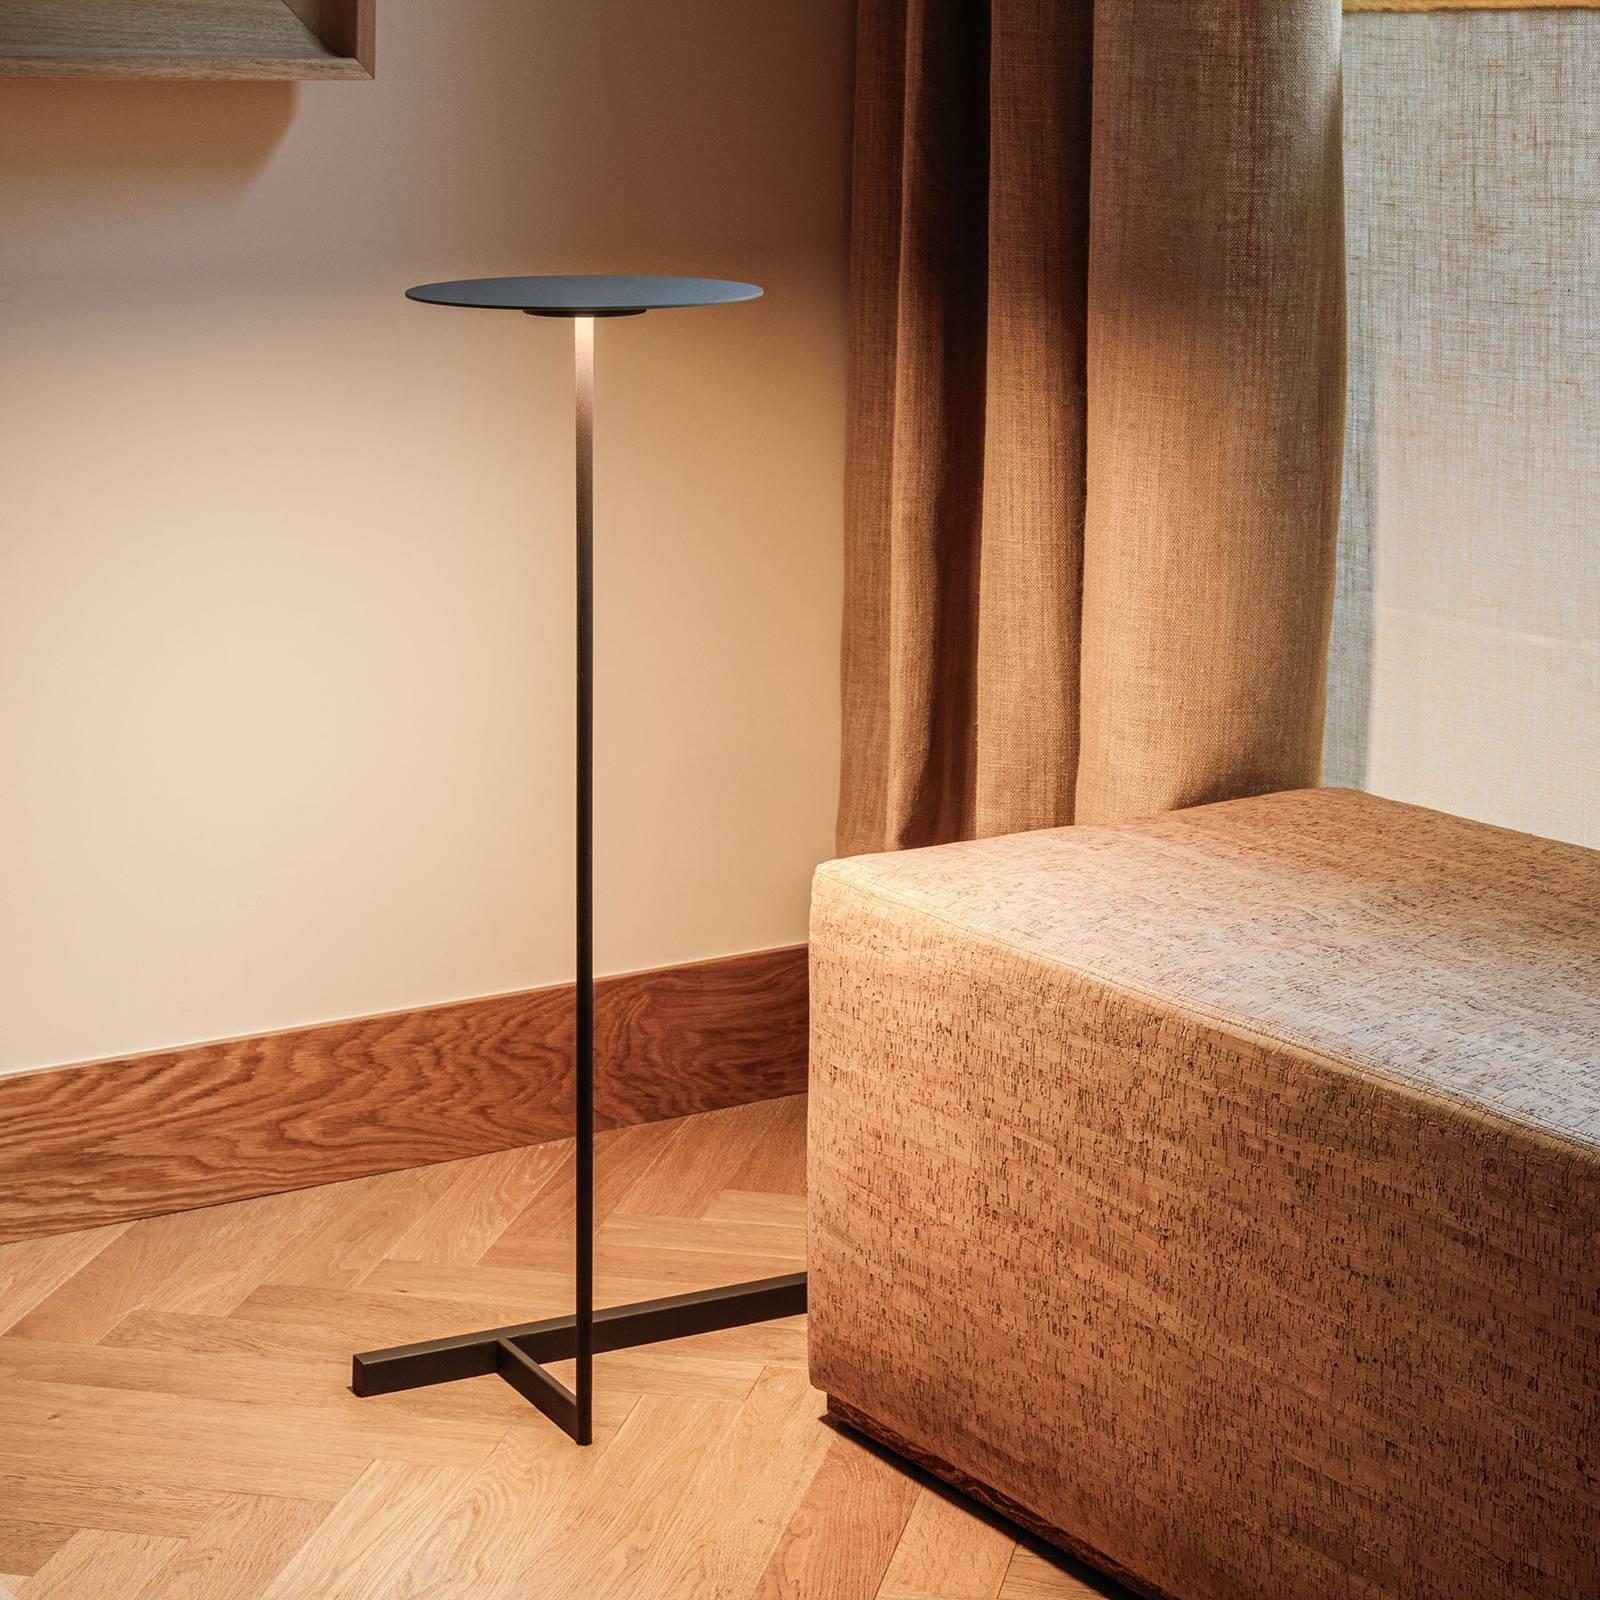 Vibia Flat lampa stojąca 96 cm szara L1 ściemniana